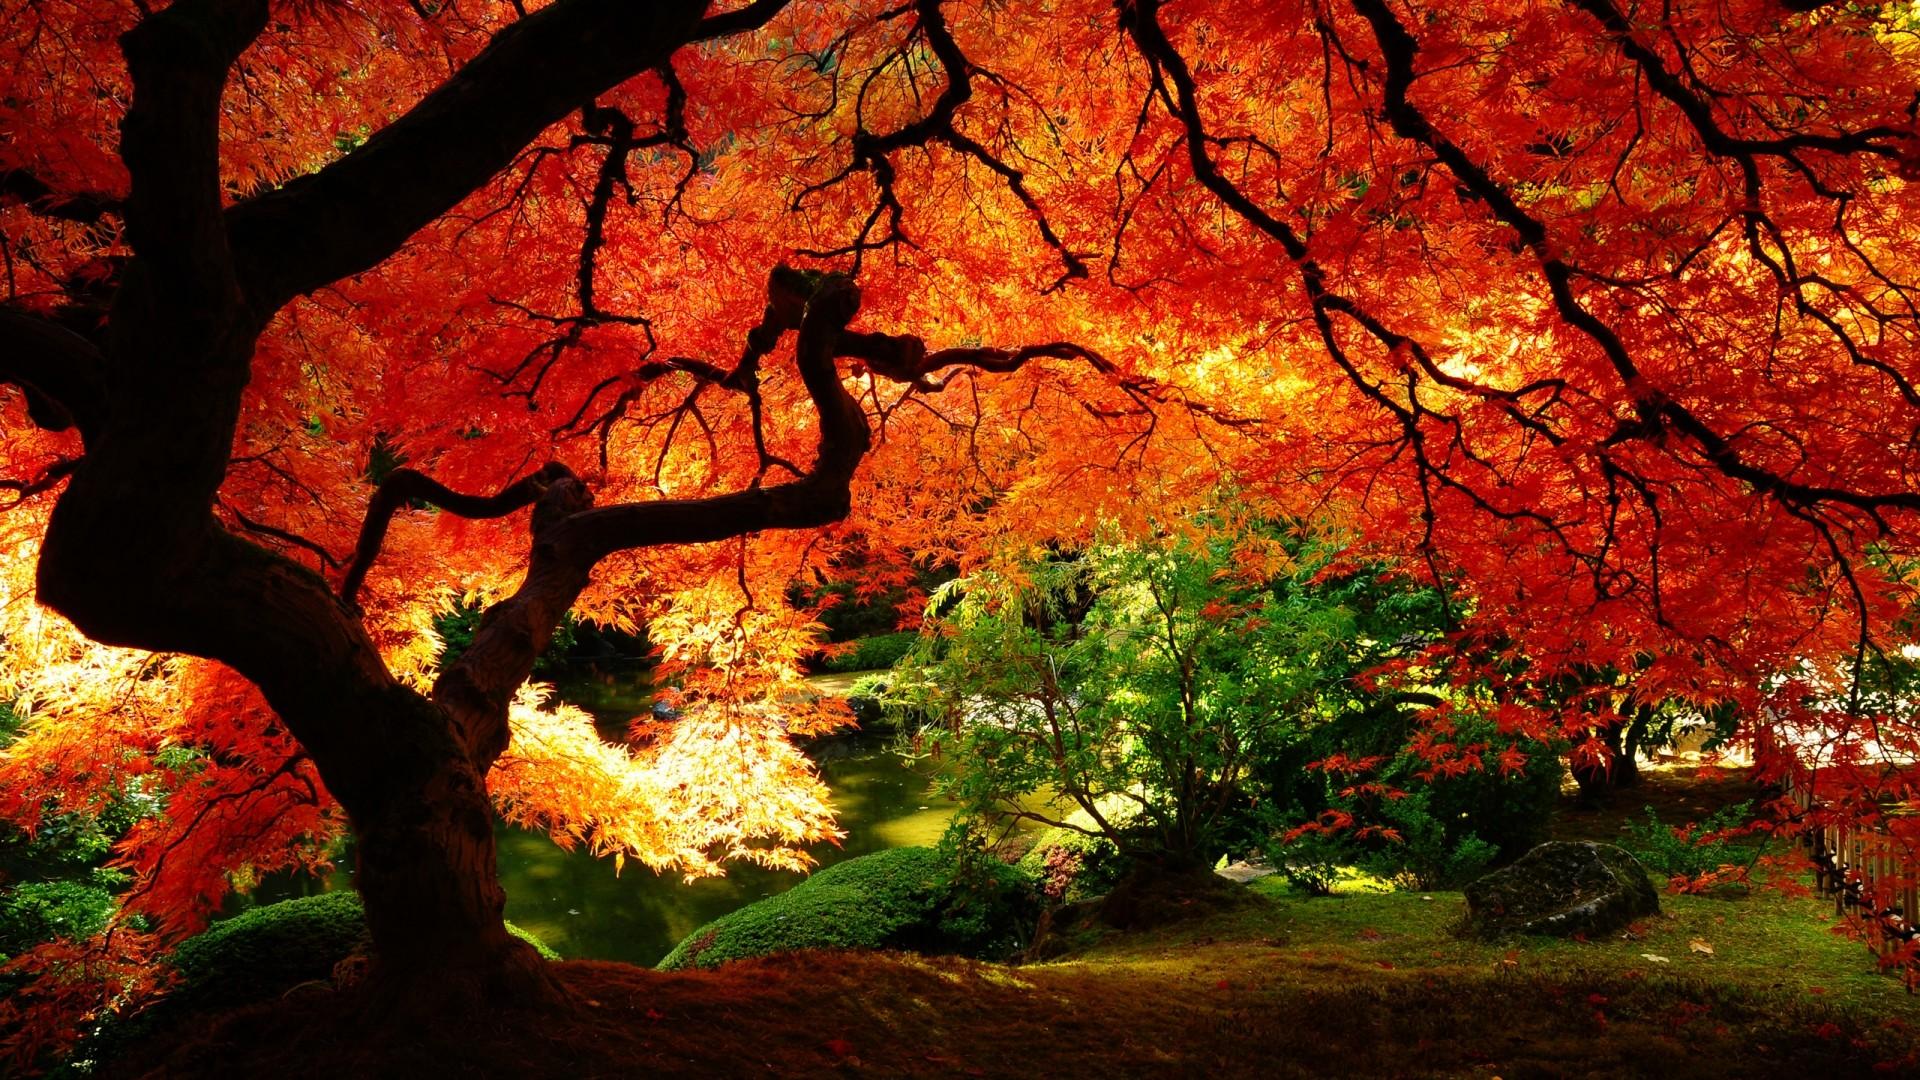 … Full HD 1080p Autumn Wallpapers HD, Desktop Backgrounds …